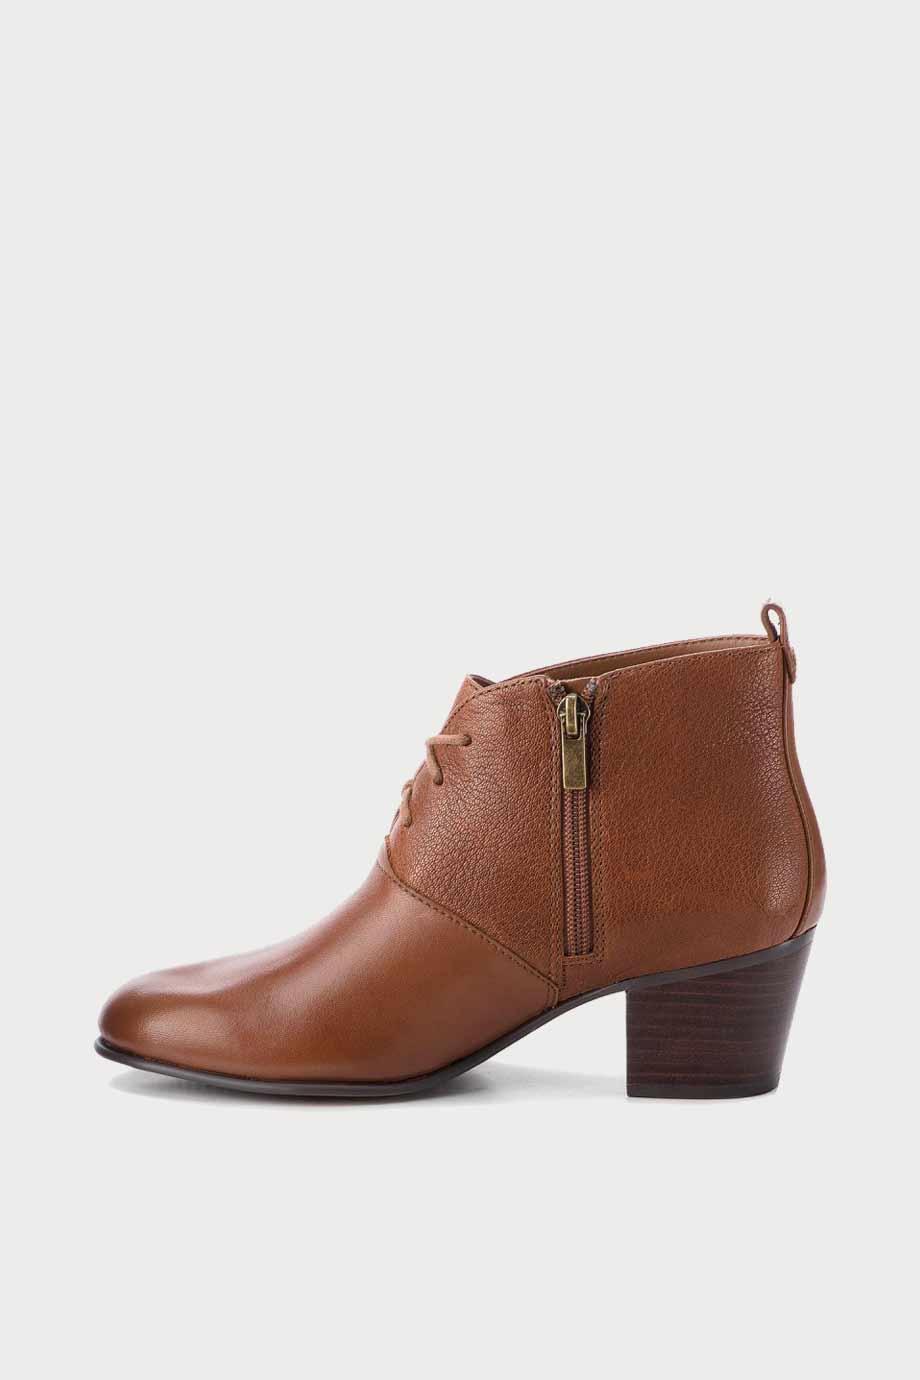 spiridoula metheniti shoes xalkida p Mypearl Lucy Tan Clarks1